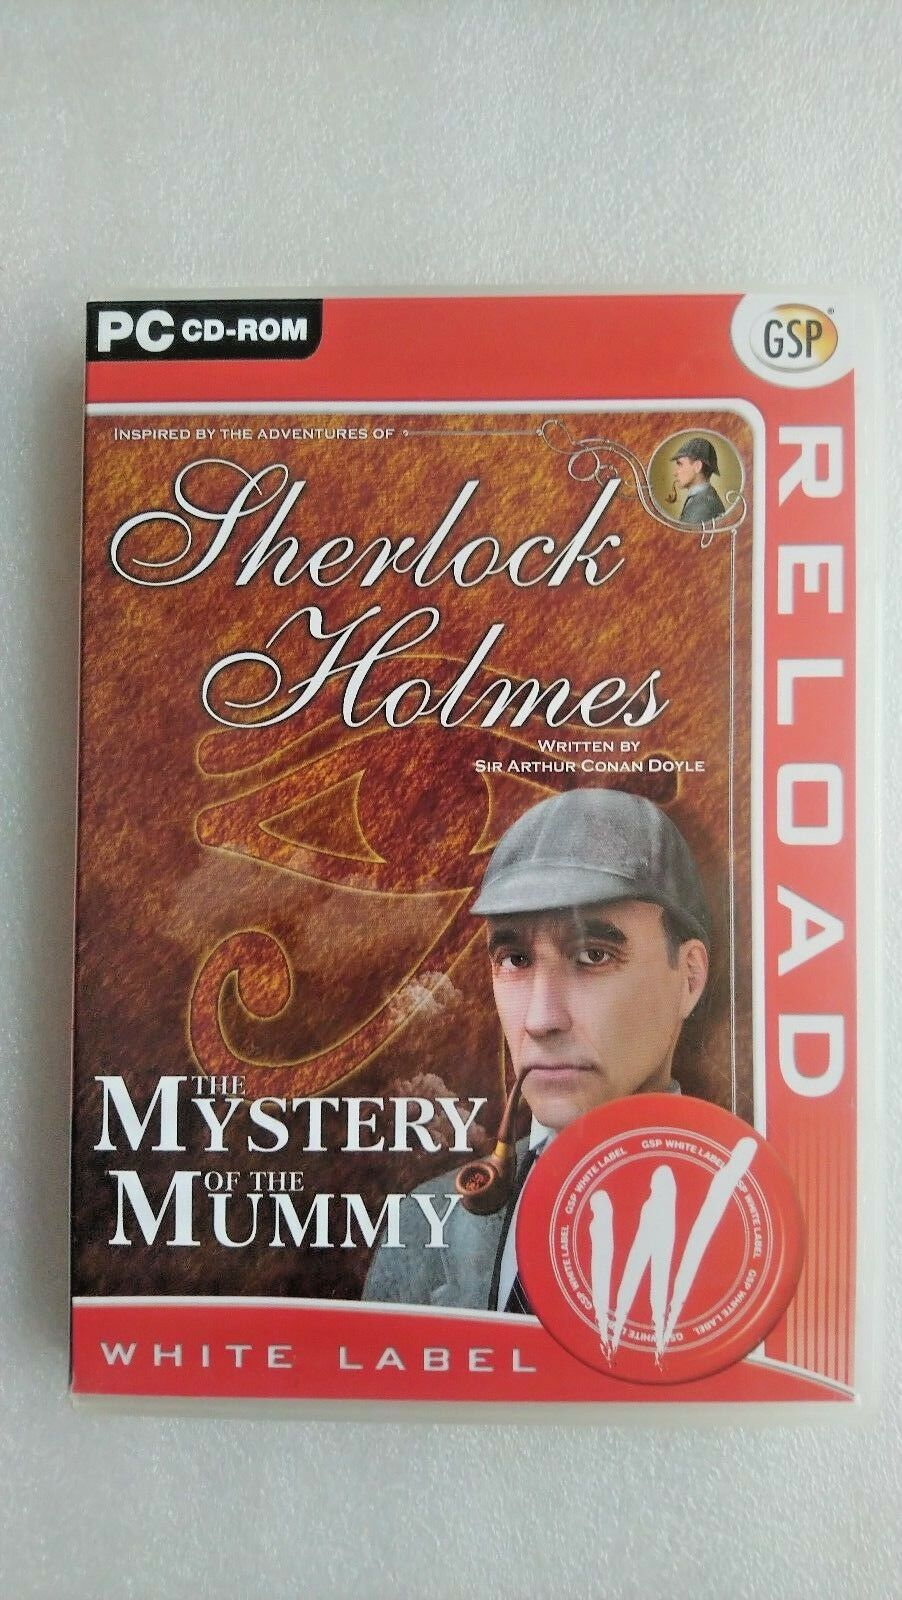 Sherlock Holmes: The Mystery Of The Mummy (PC:, 2002) -  The Adventure Company